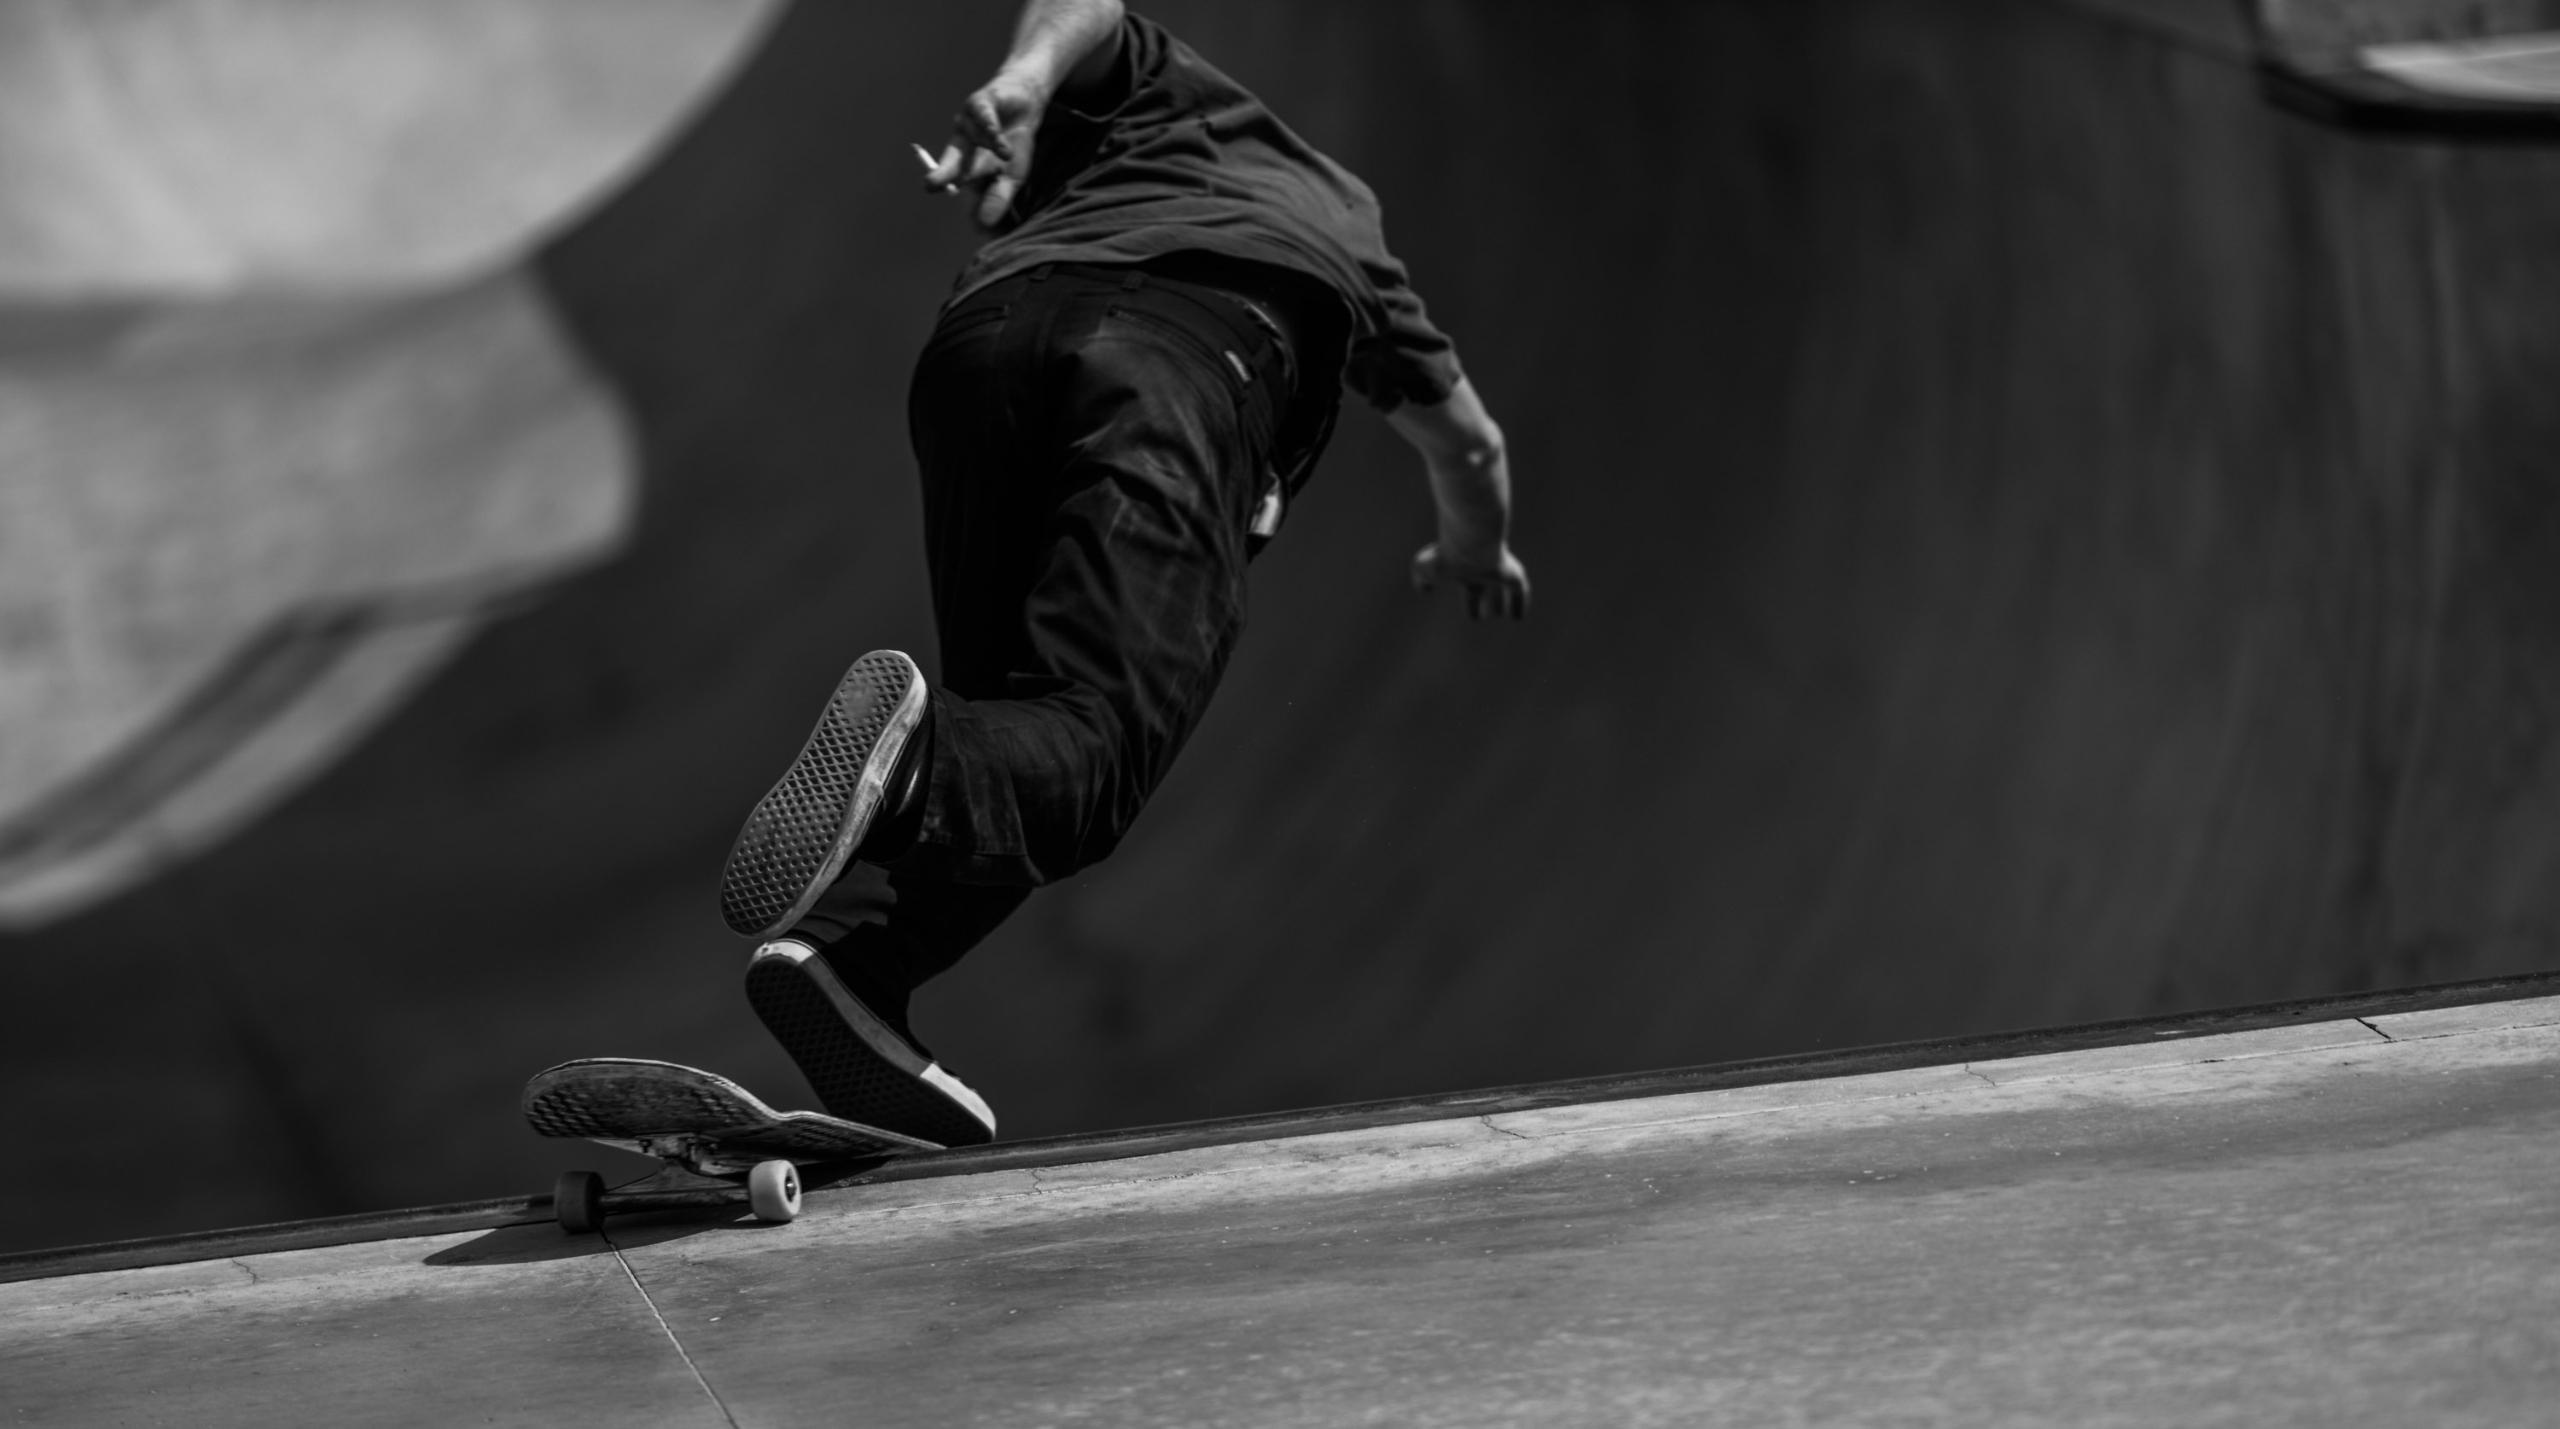 skate park days - blackandwhite - ben-staley | ello